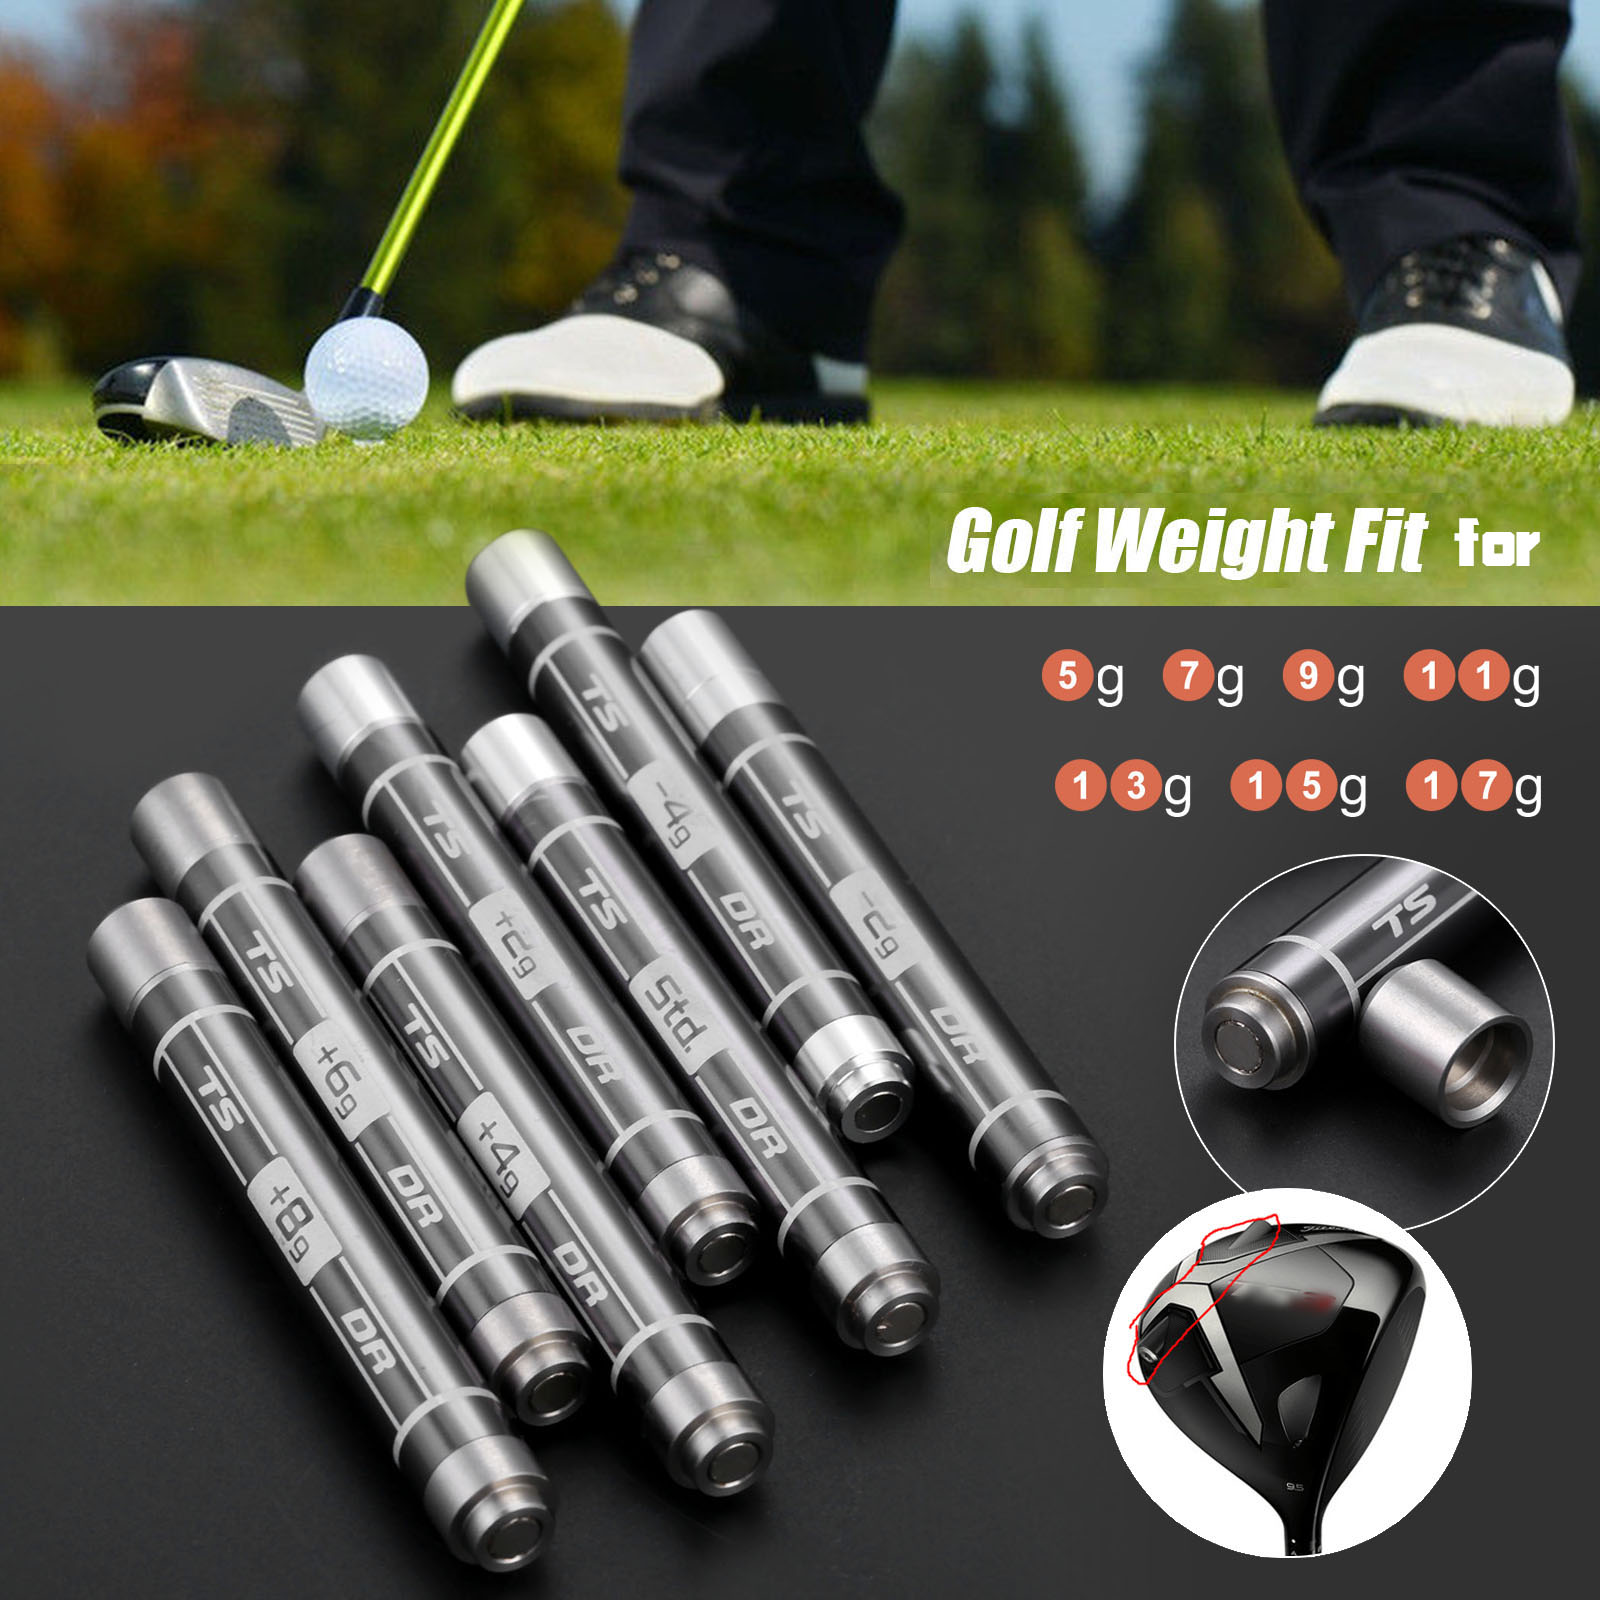 1Pc 5g 7g 9g 11g 13g 15g 17g Stainless Steel Golf Weight For Titleist TS3 Driver Golf Club Head Adding Weights Screw Accessories